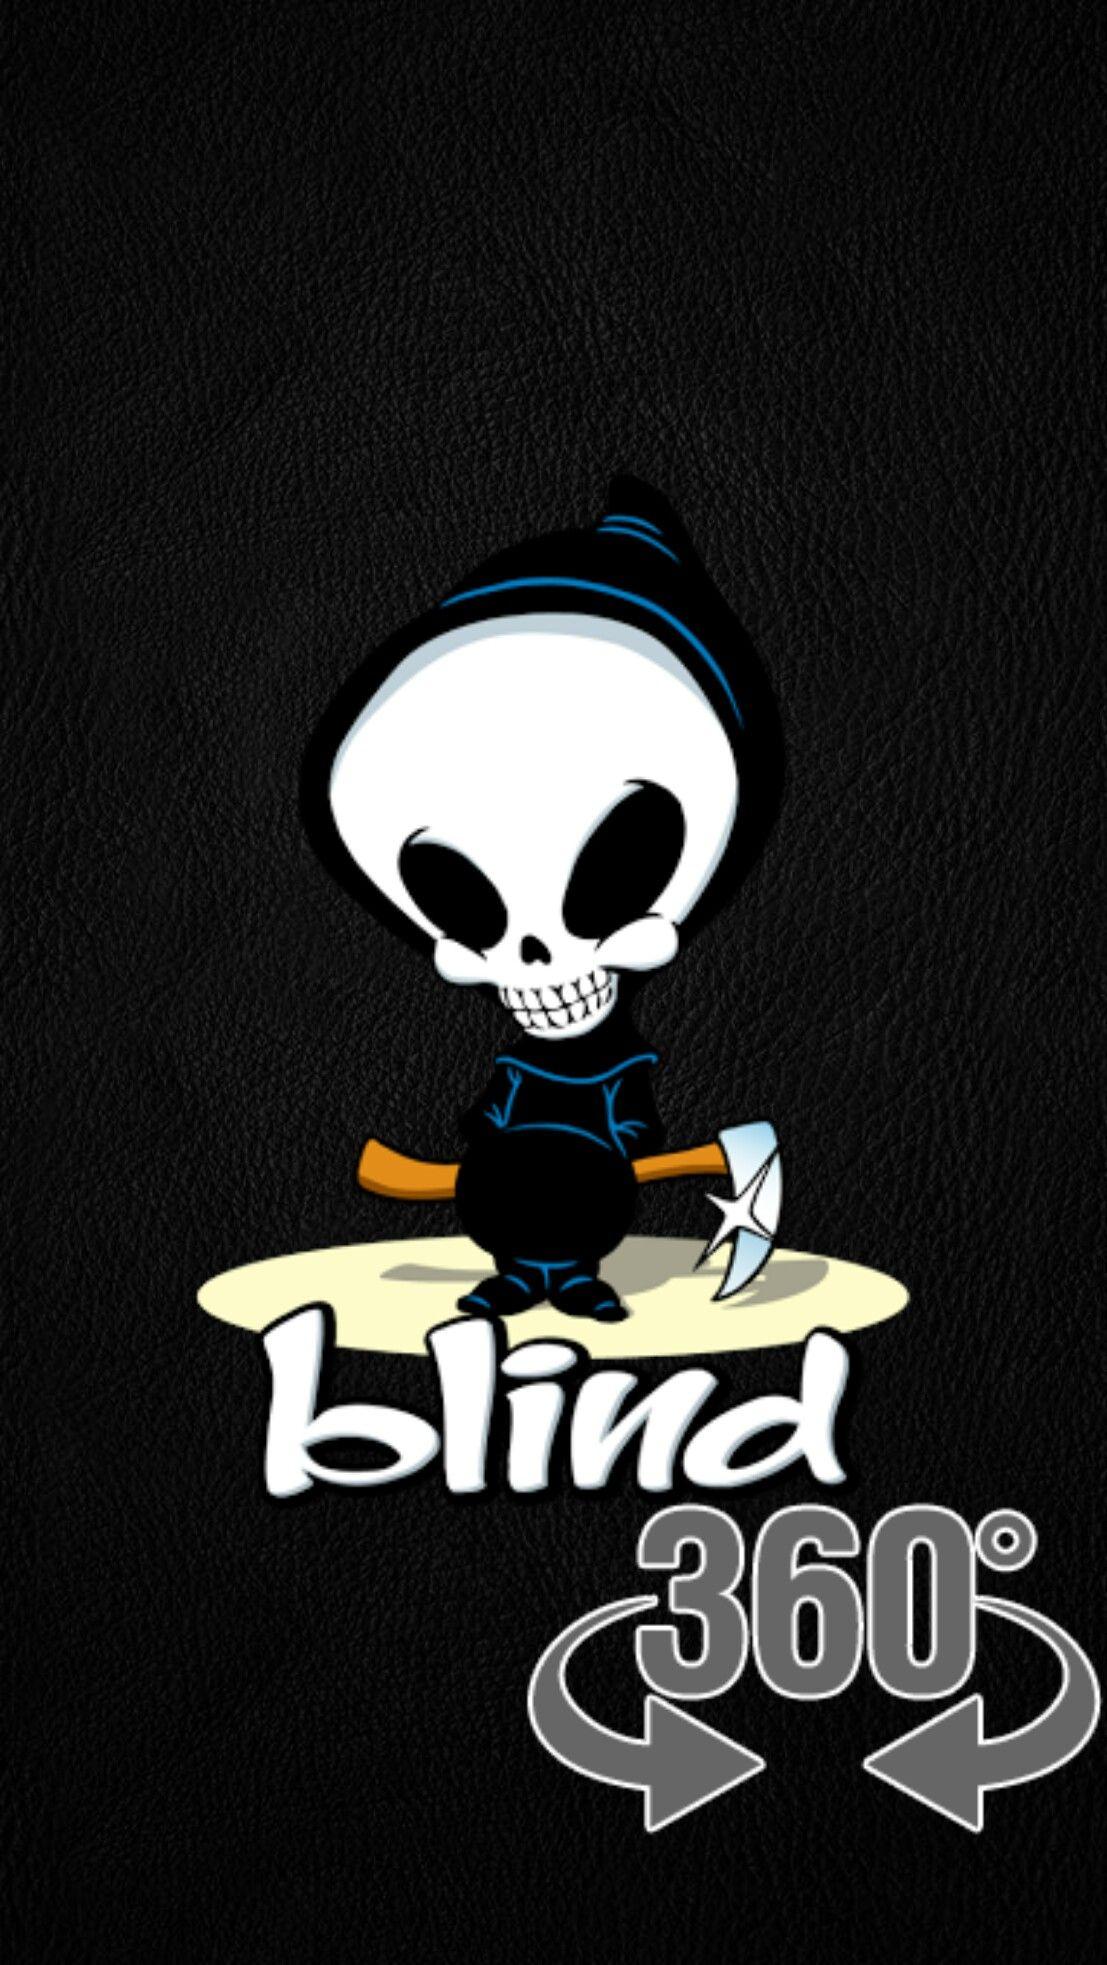 Skateboard Loading Black Wallpaper Android Iphone Skateboard Logo Blind Skateboards Emo Wallpaper